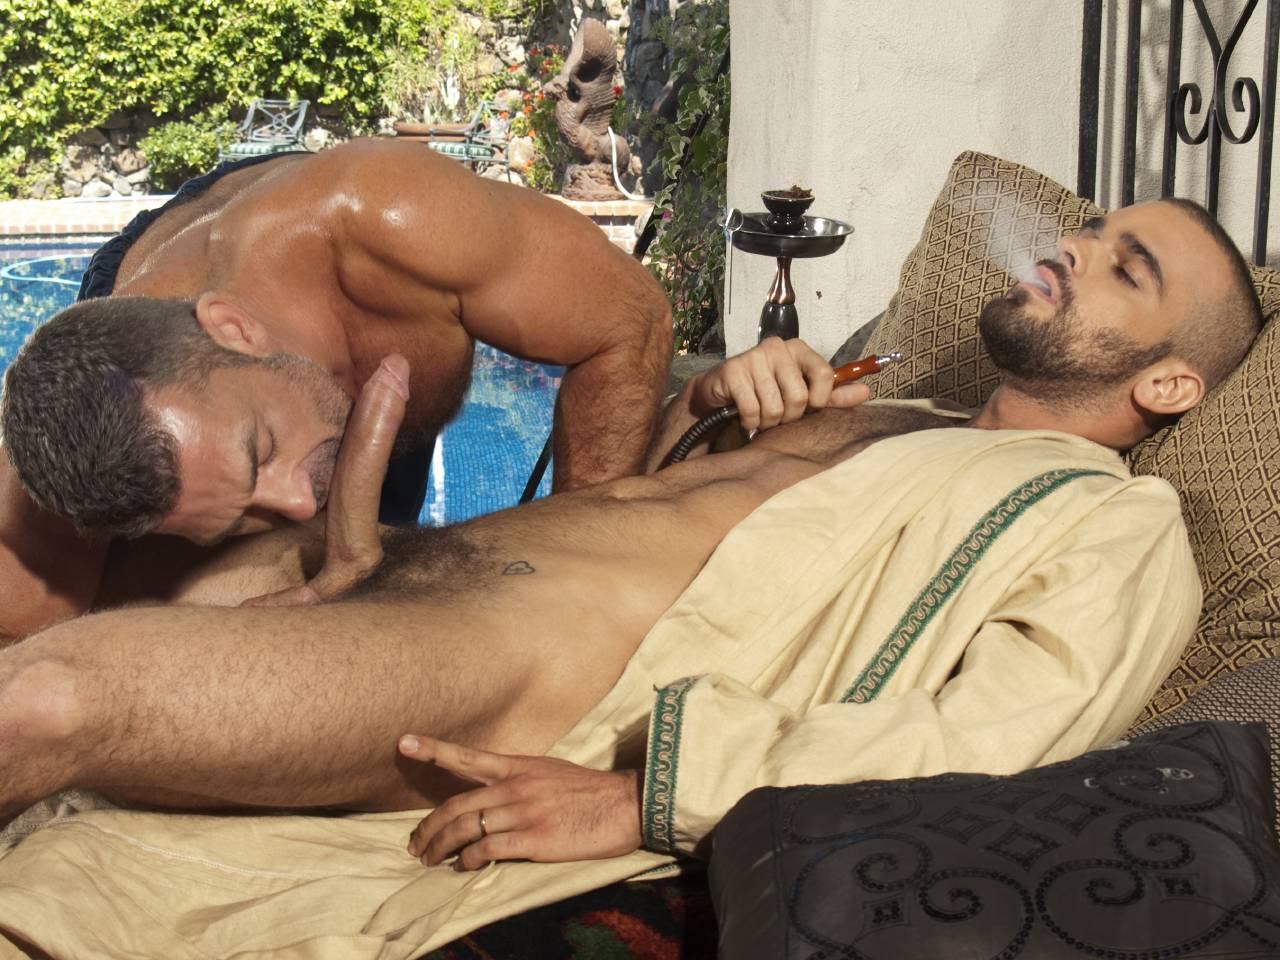 Rencontre Gay Chambery Cul De Mec Site De Rencontres Gay